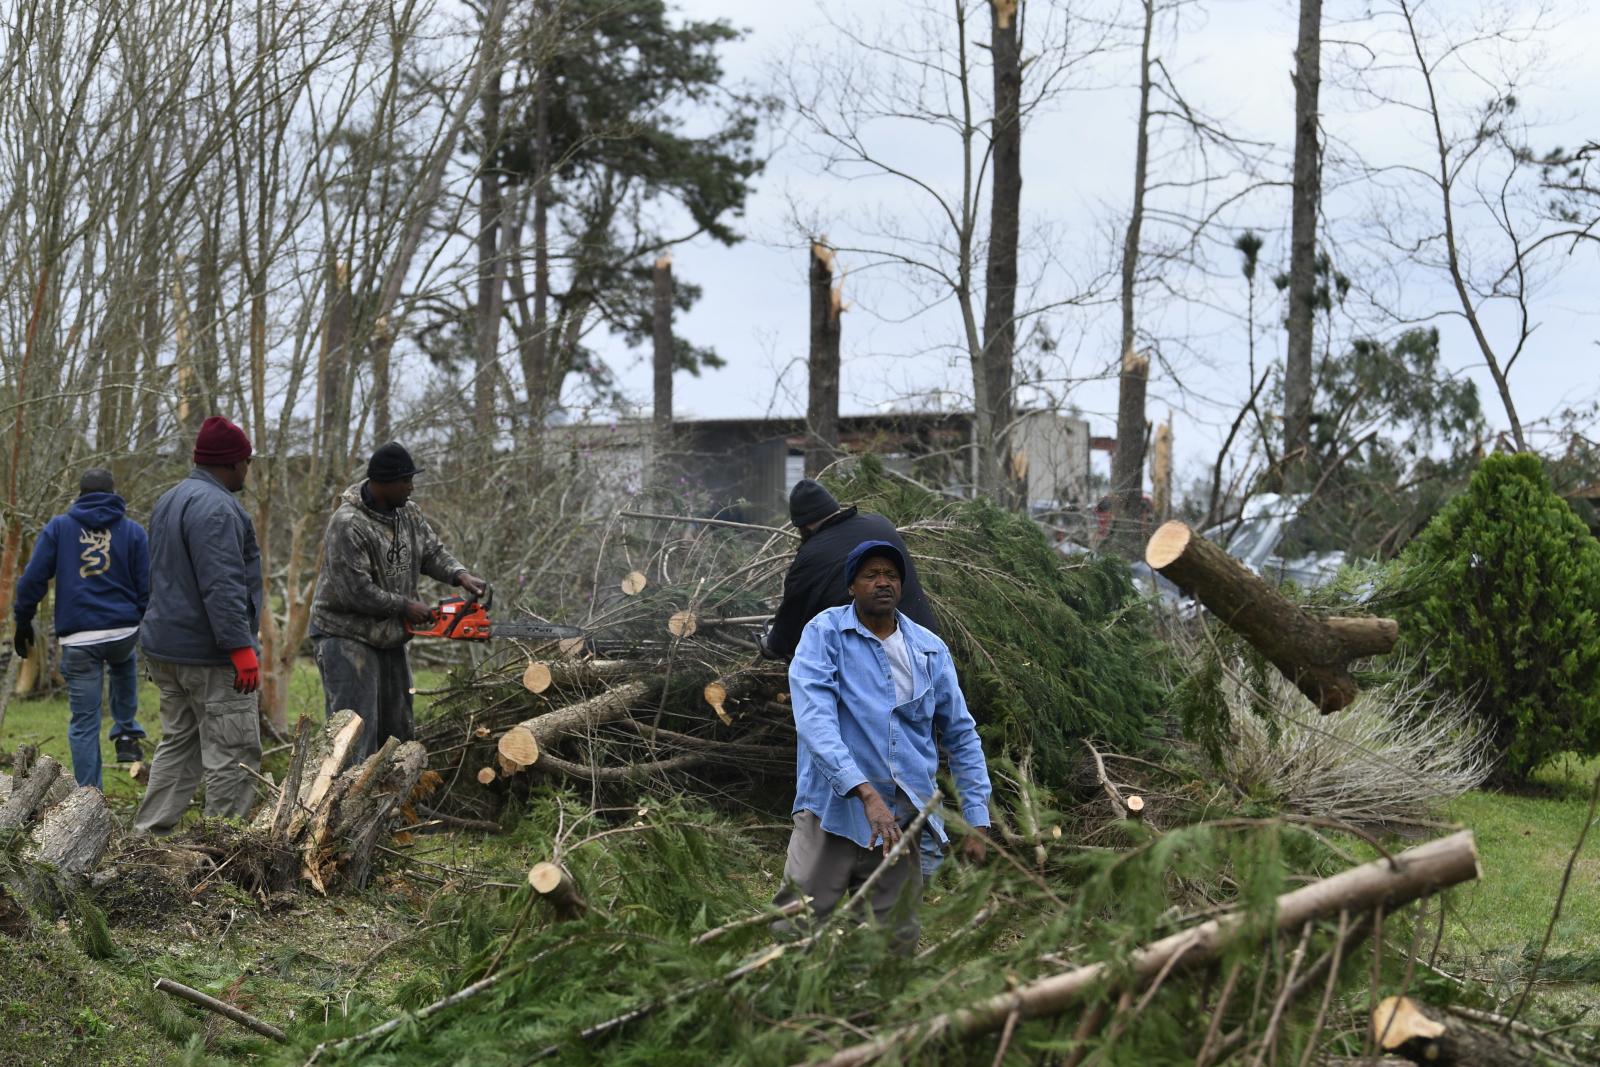 Tornado w Alabamie fot. EPA/JOHN AMIS